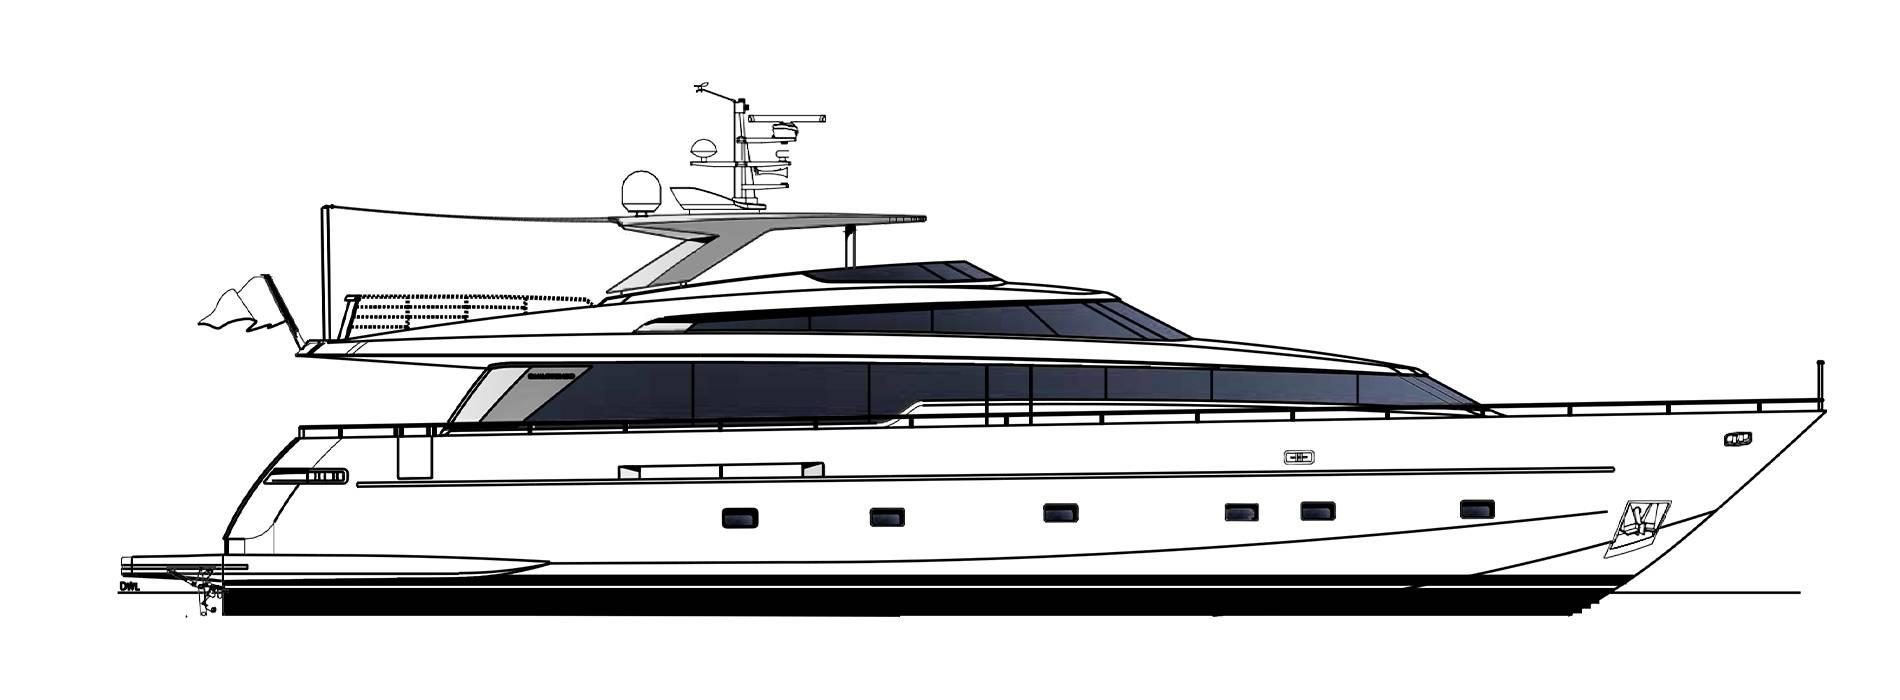 Sanlorenzo Yachts SL96-623 Profilo